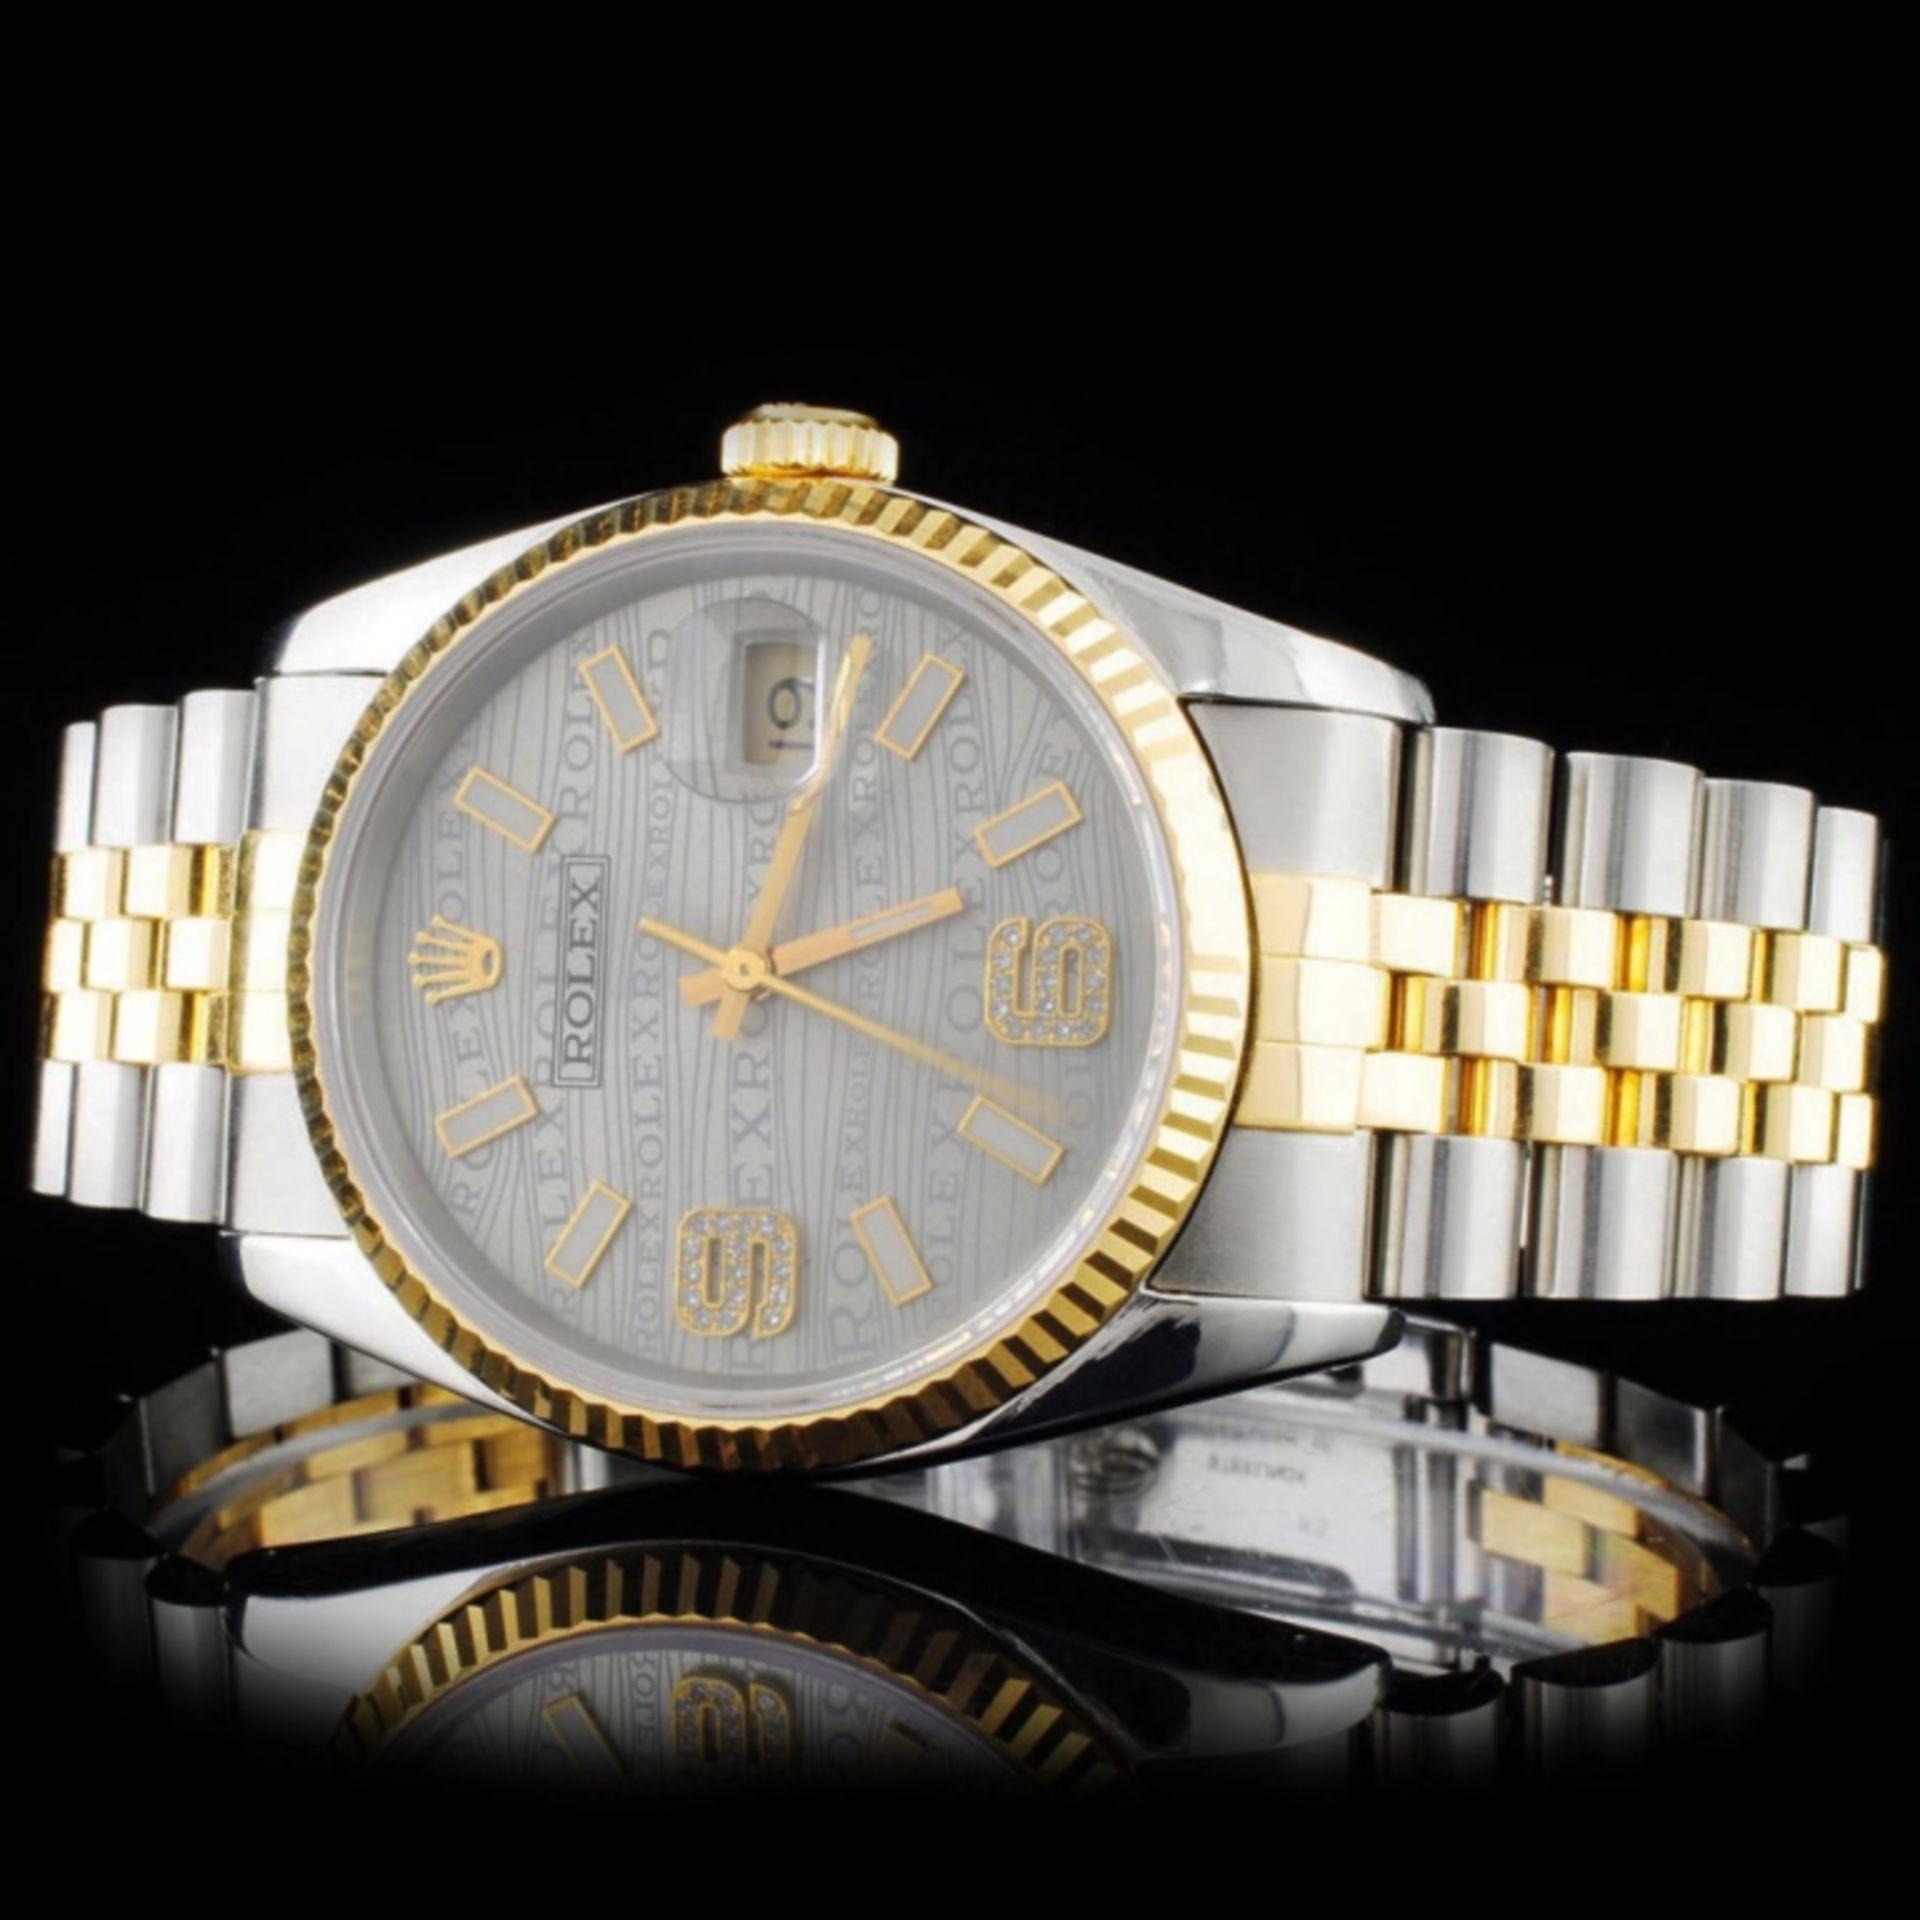 Rolex YG/SS 36MM DateJust Diamond Wristwatch - Image 2 of 5